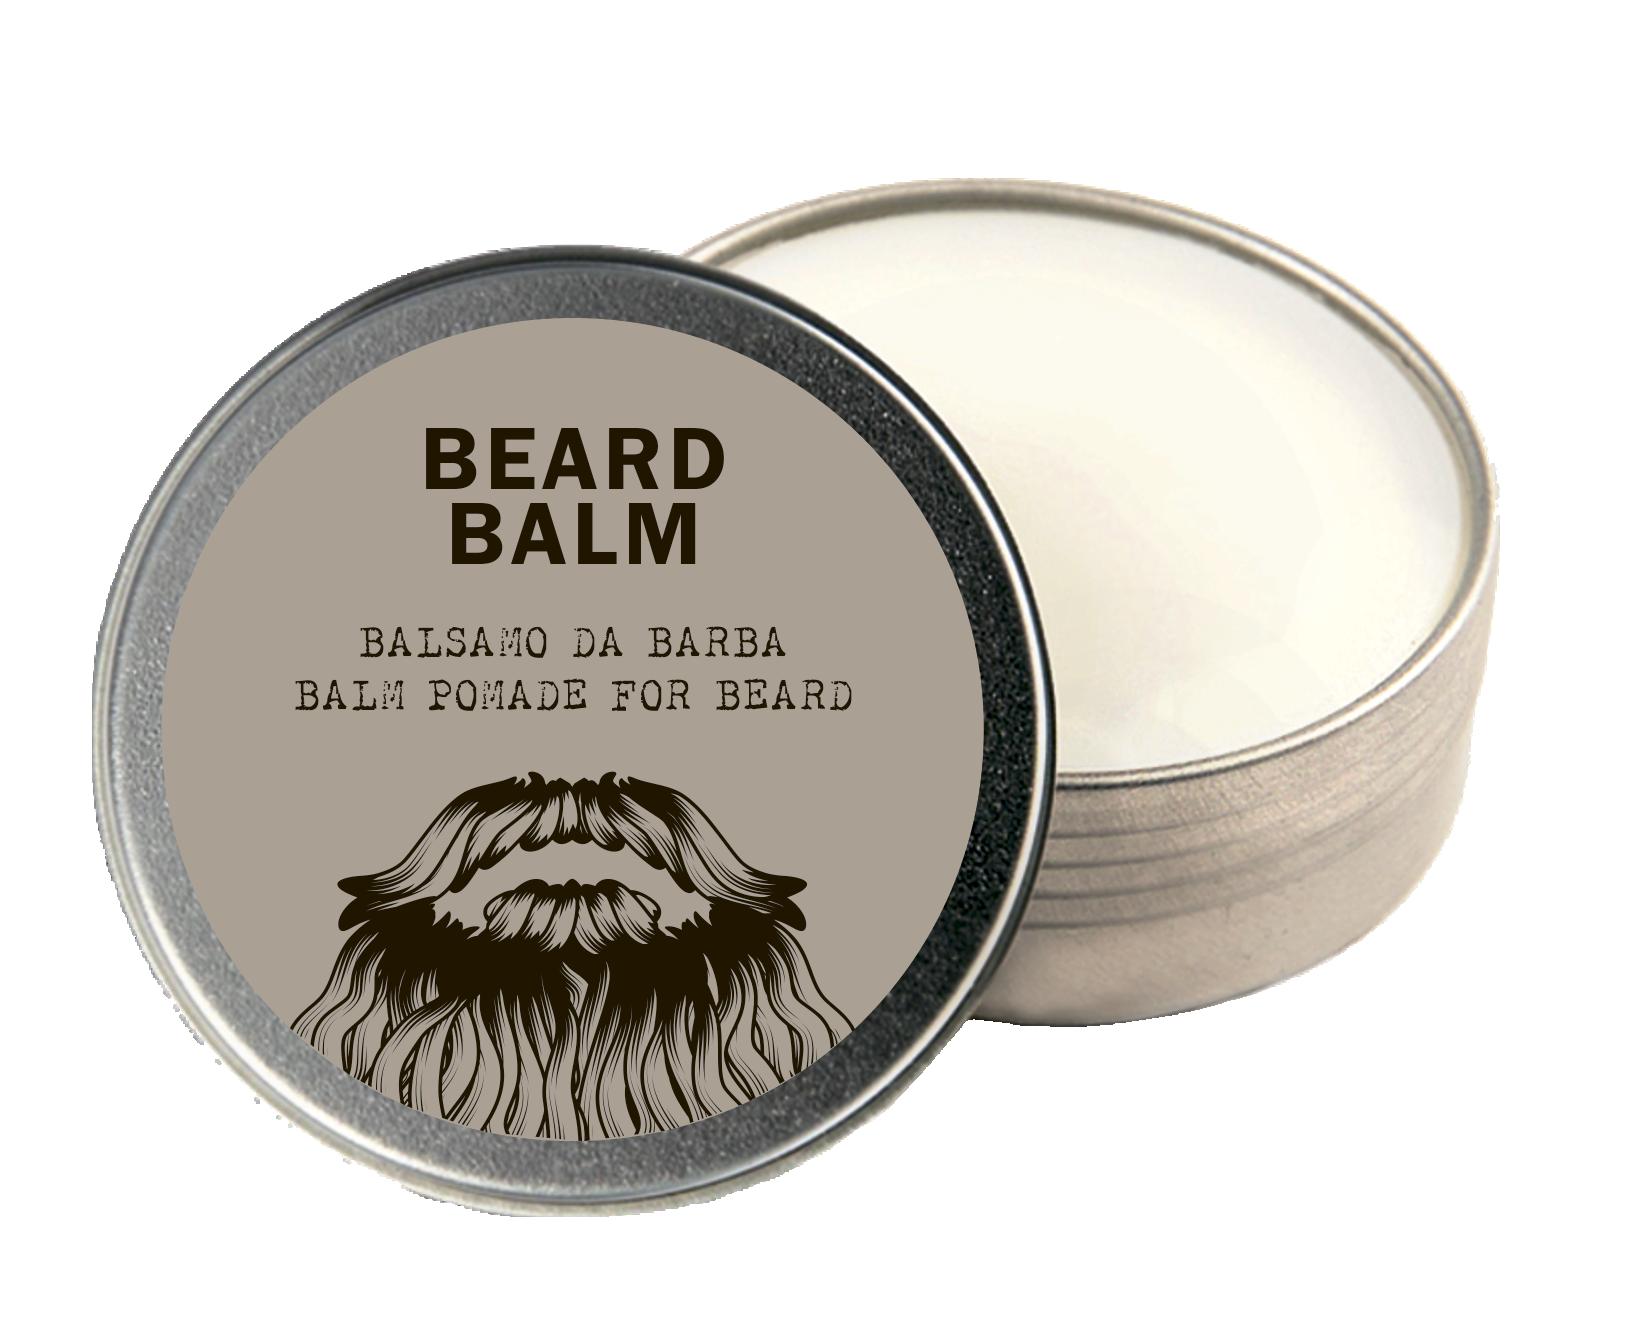 DEAR BEARD Бальзам для бороды / BEARD BALM 50мл